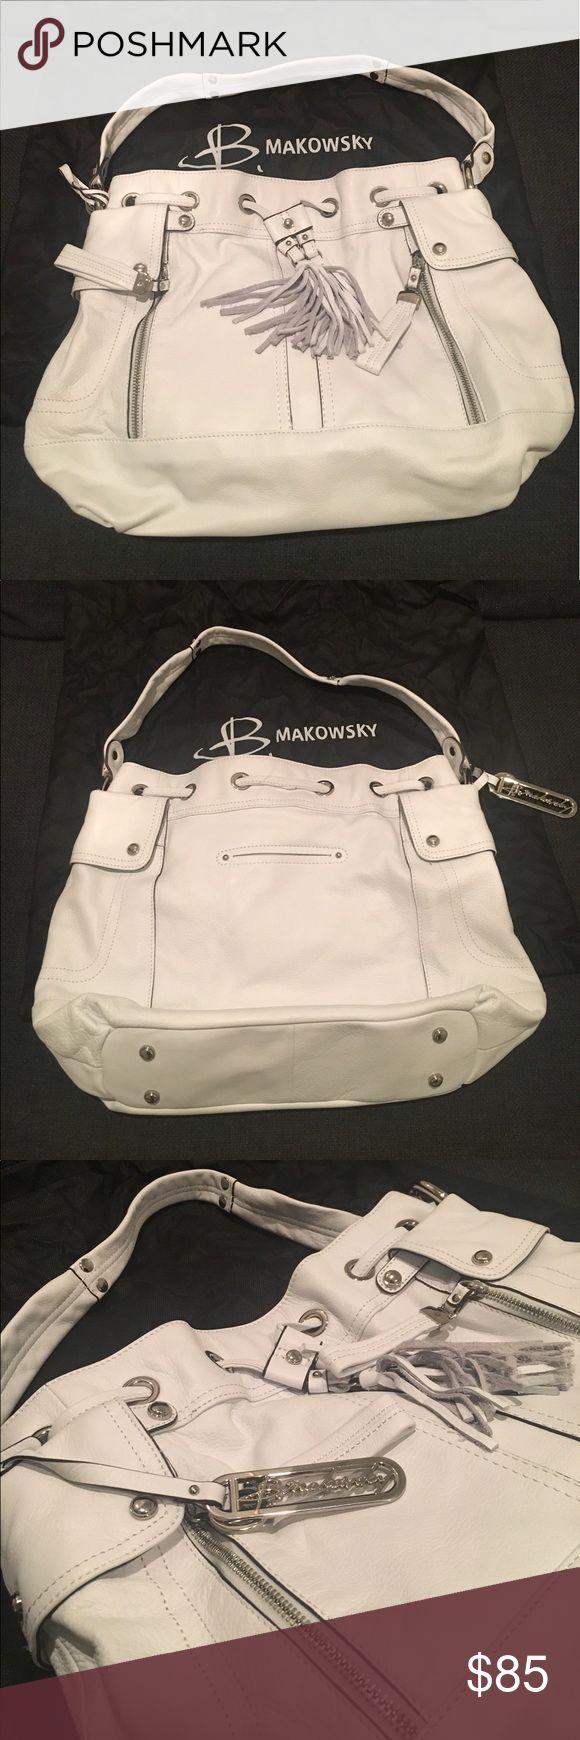 White b. makowsky shoulder bag. White b. makowsky handbag. Barely used. Excellent condition. b. makowsky Bags Shoulder Bags